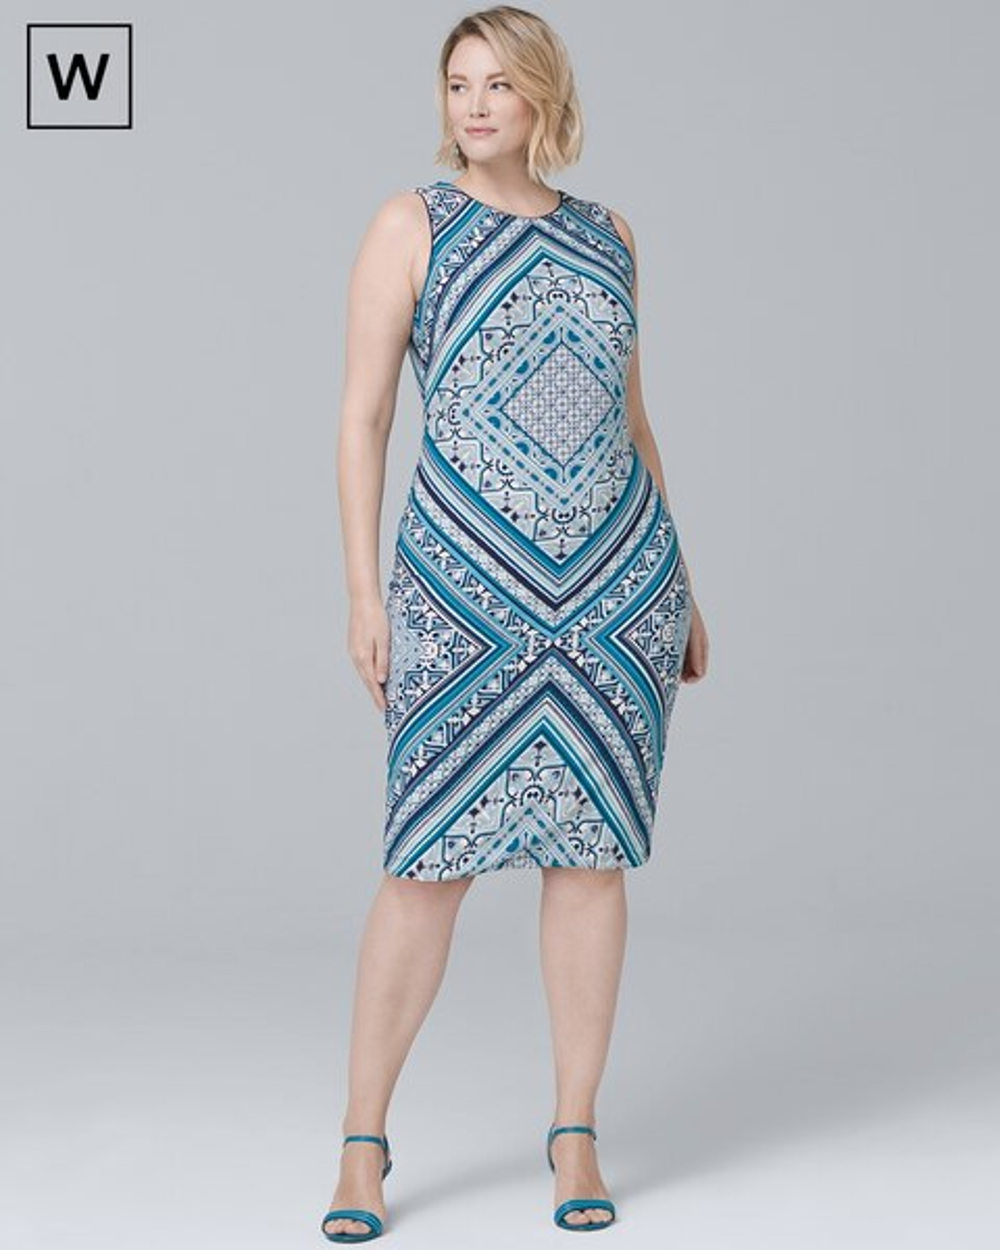 c21fac89 Plus Reversible Scarf-Print Knit Sheath Dress - White House Black Market